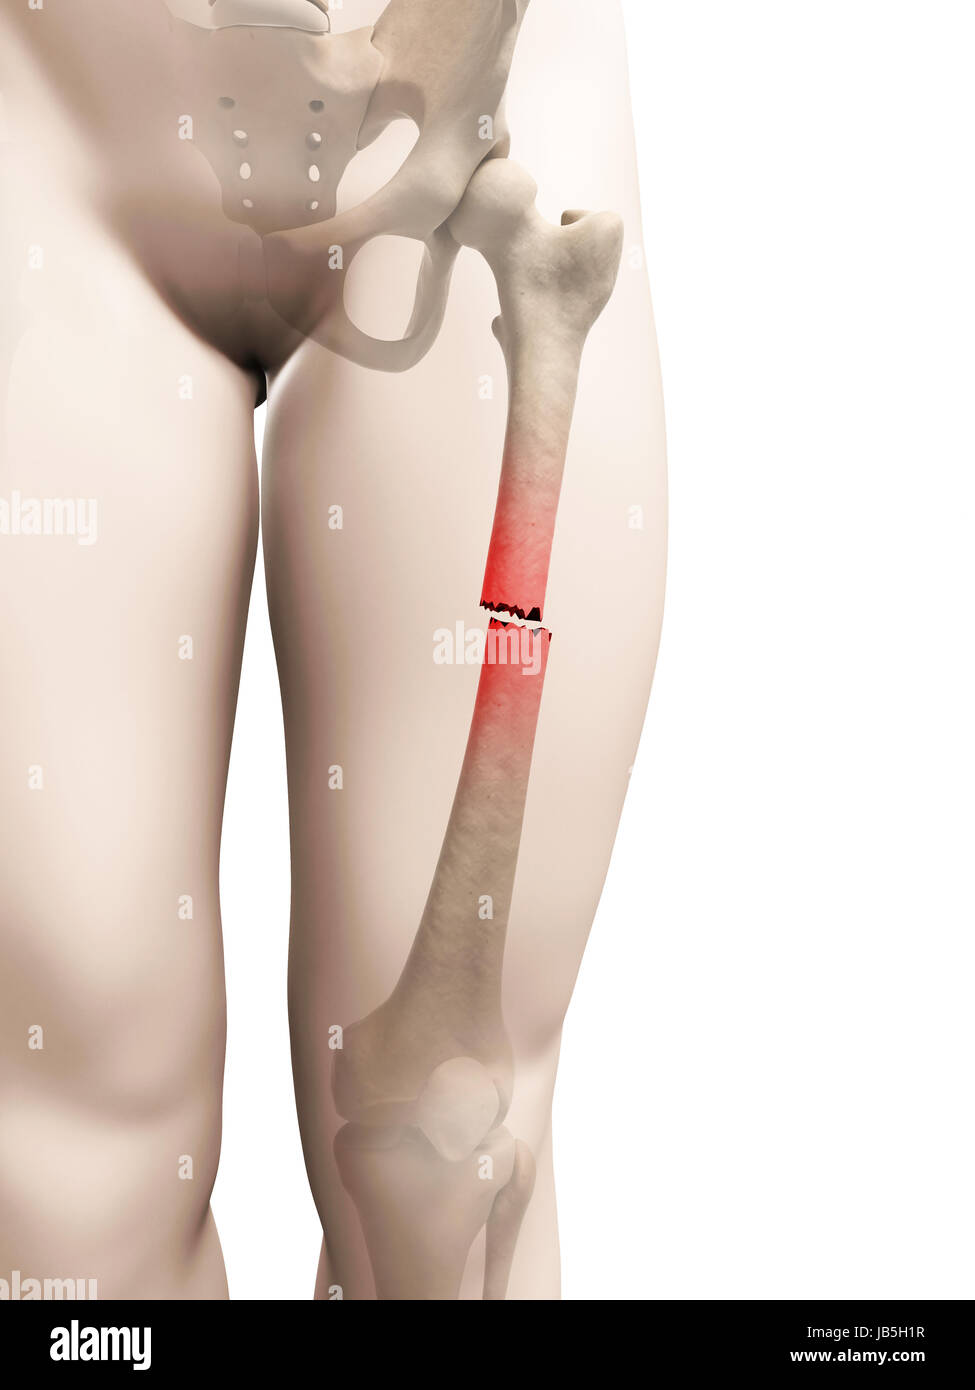 medical illustration of a broken leg bone Stock Photo: 144567299 - Alamy